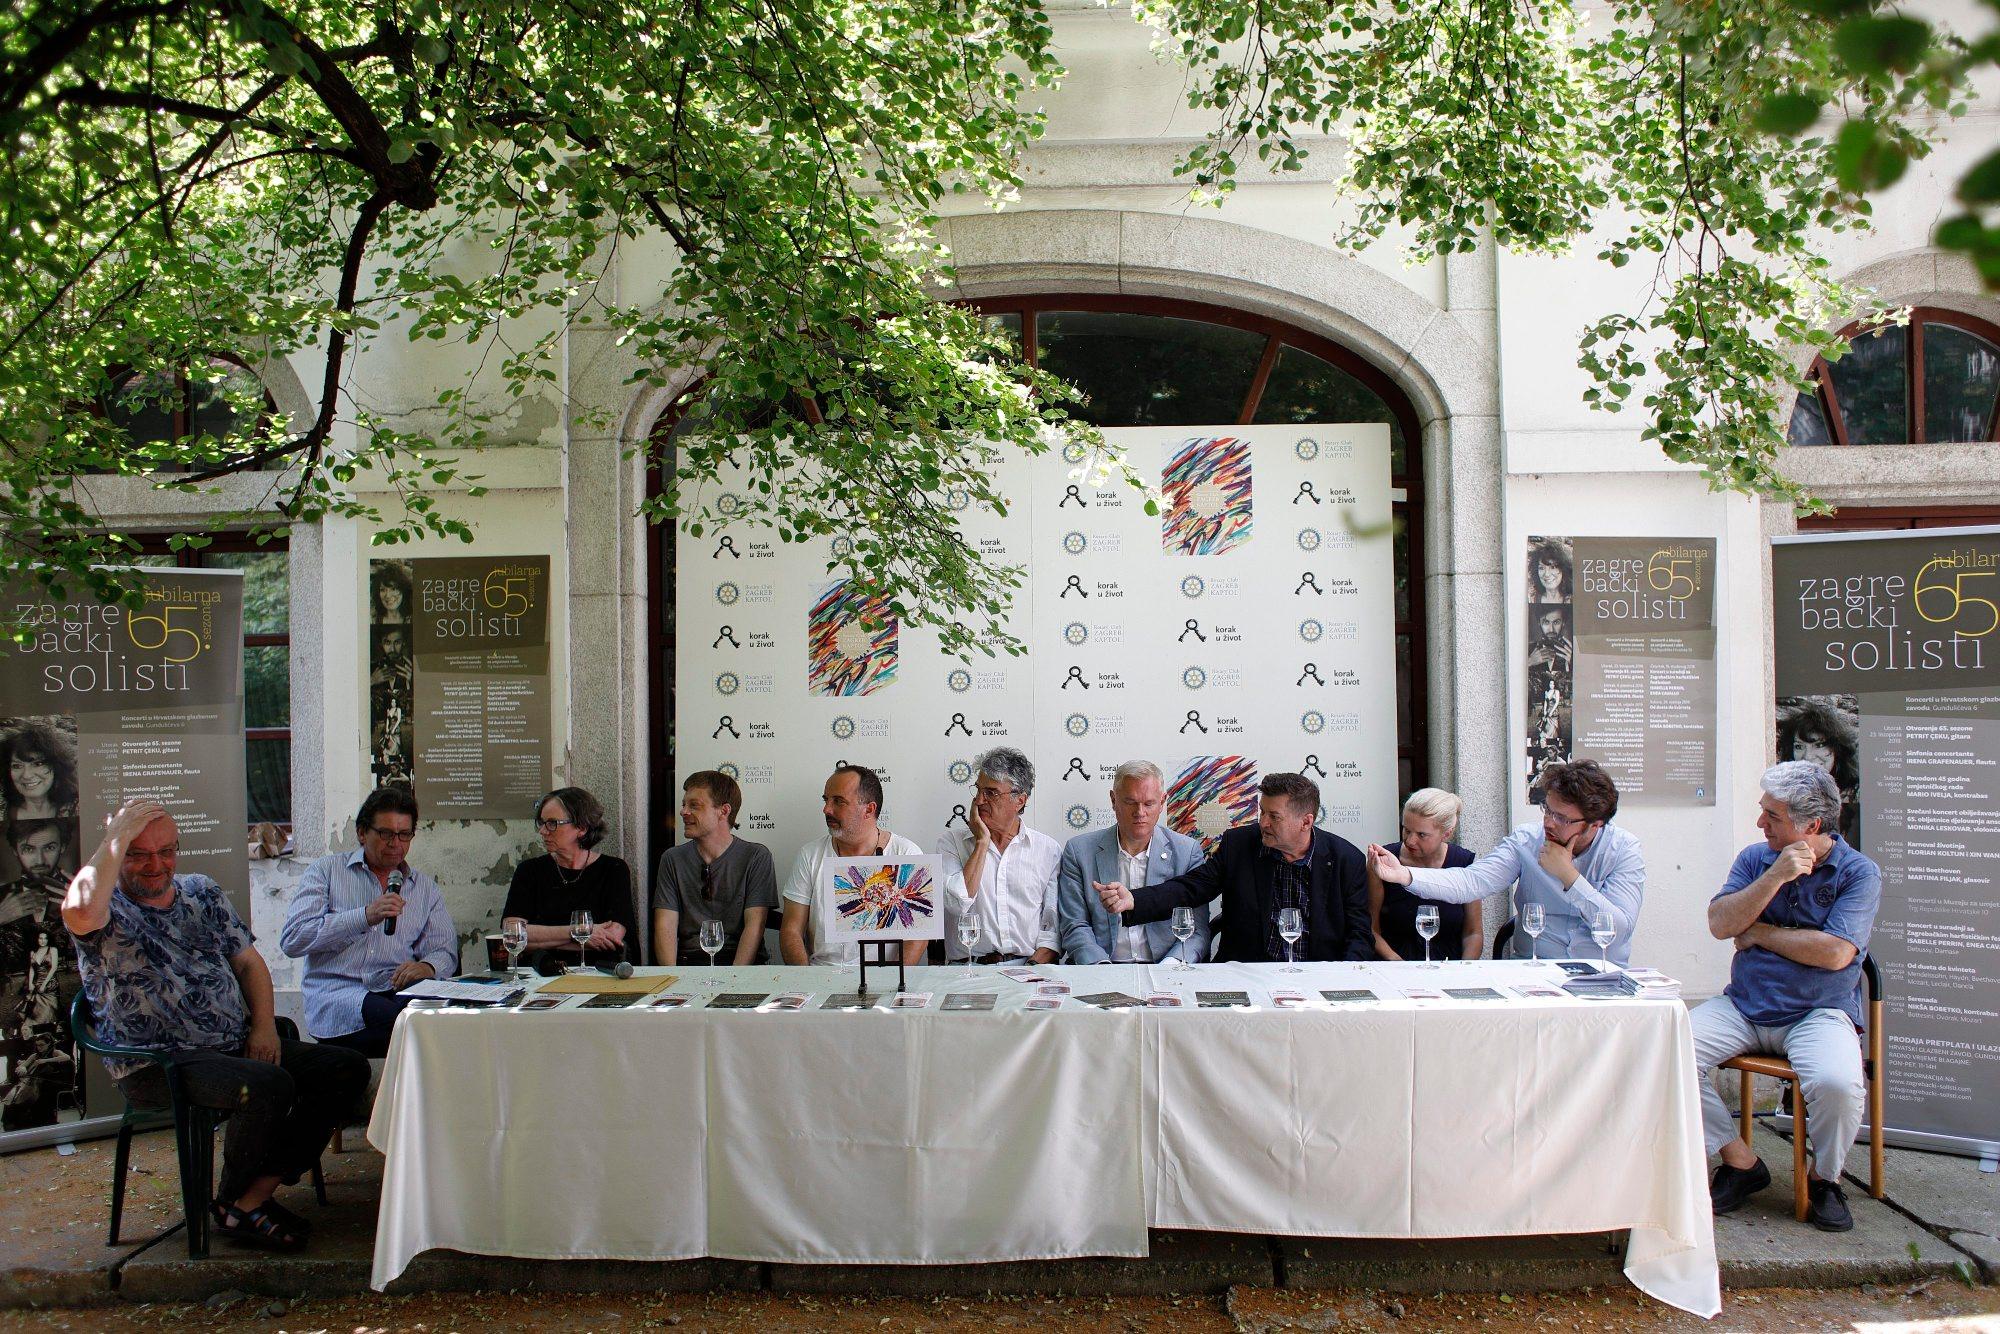 Na fotografiji: Nenad Jandrić, Dora Kovačević, Matija Dedić, Toni Cetinski, Vatroslav Kuliš, Milana Vuković Runjić, Krunoslav Marić